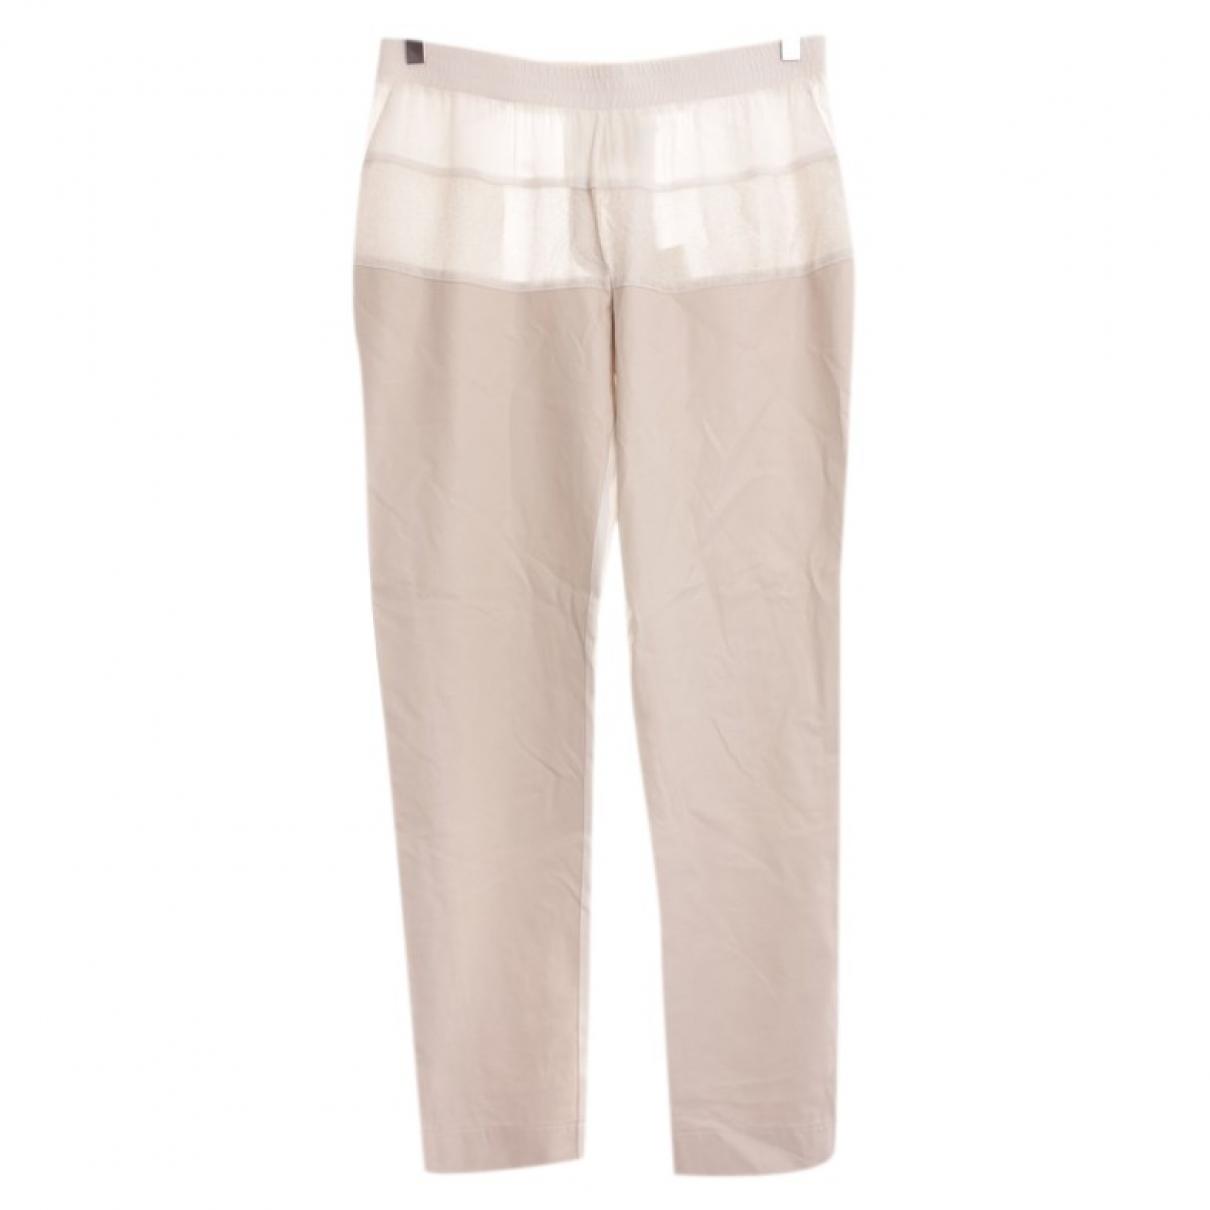 Pantalon en Viscosa Blanco 8pm